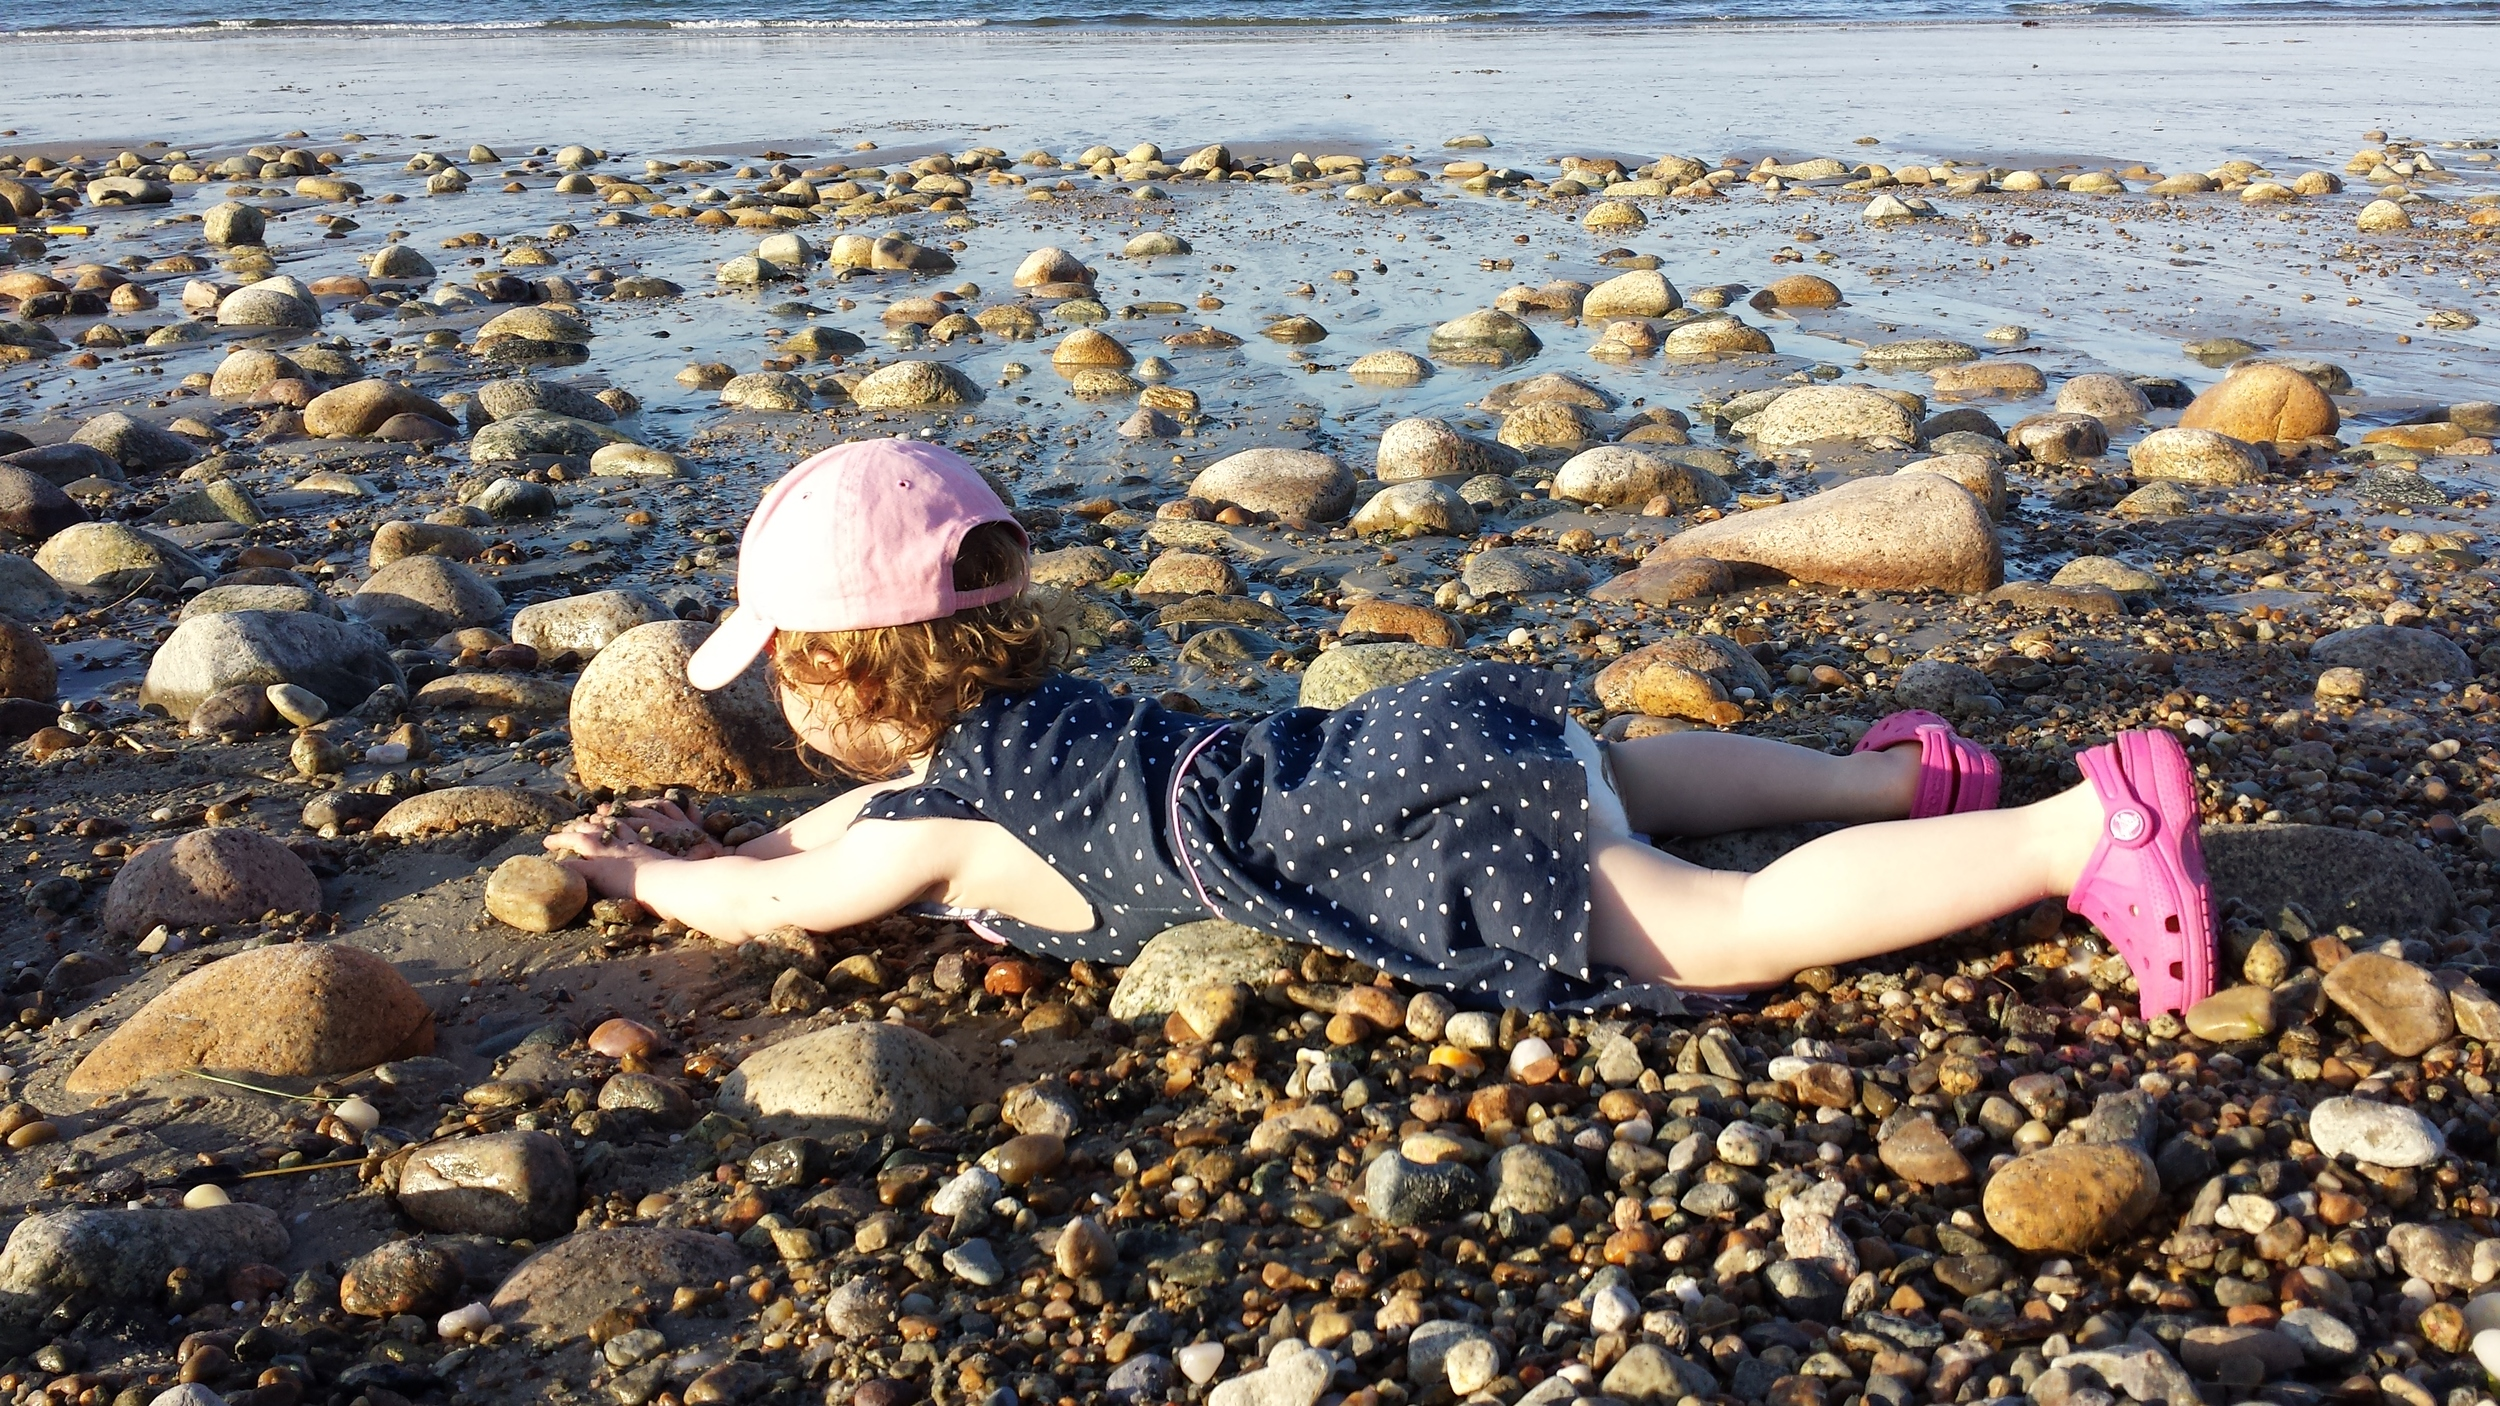 My child, licking algae off of rocks -_-